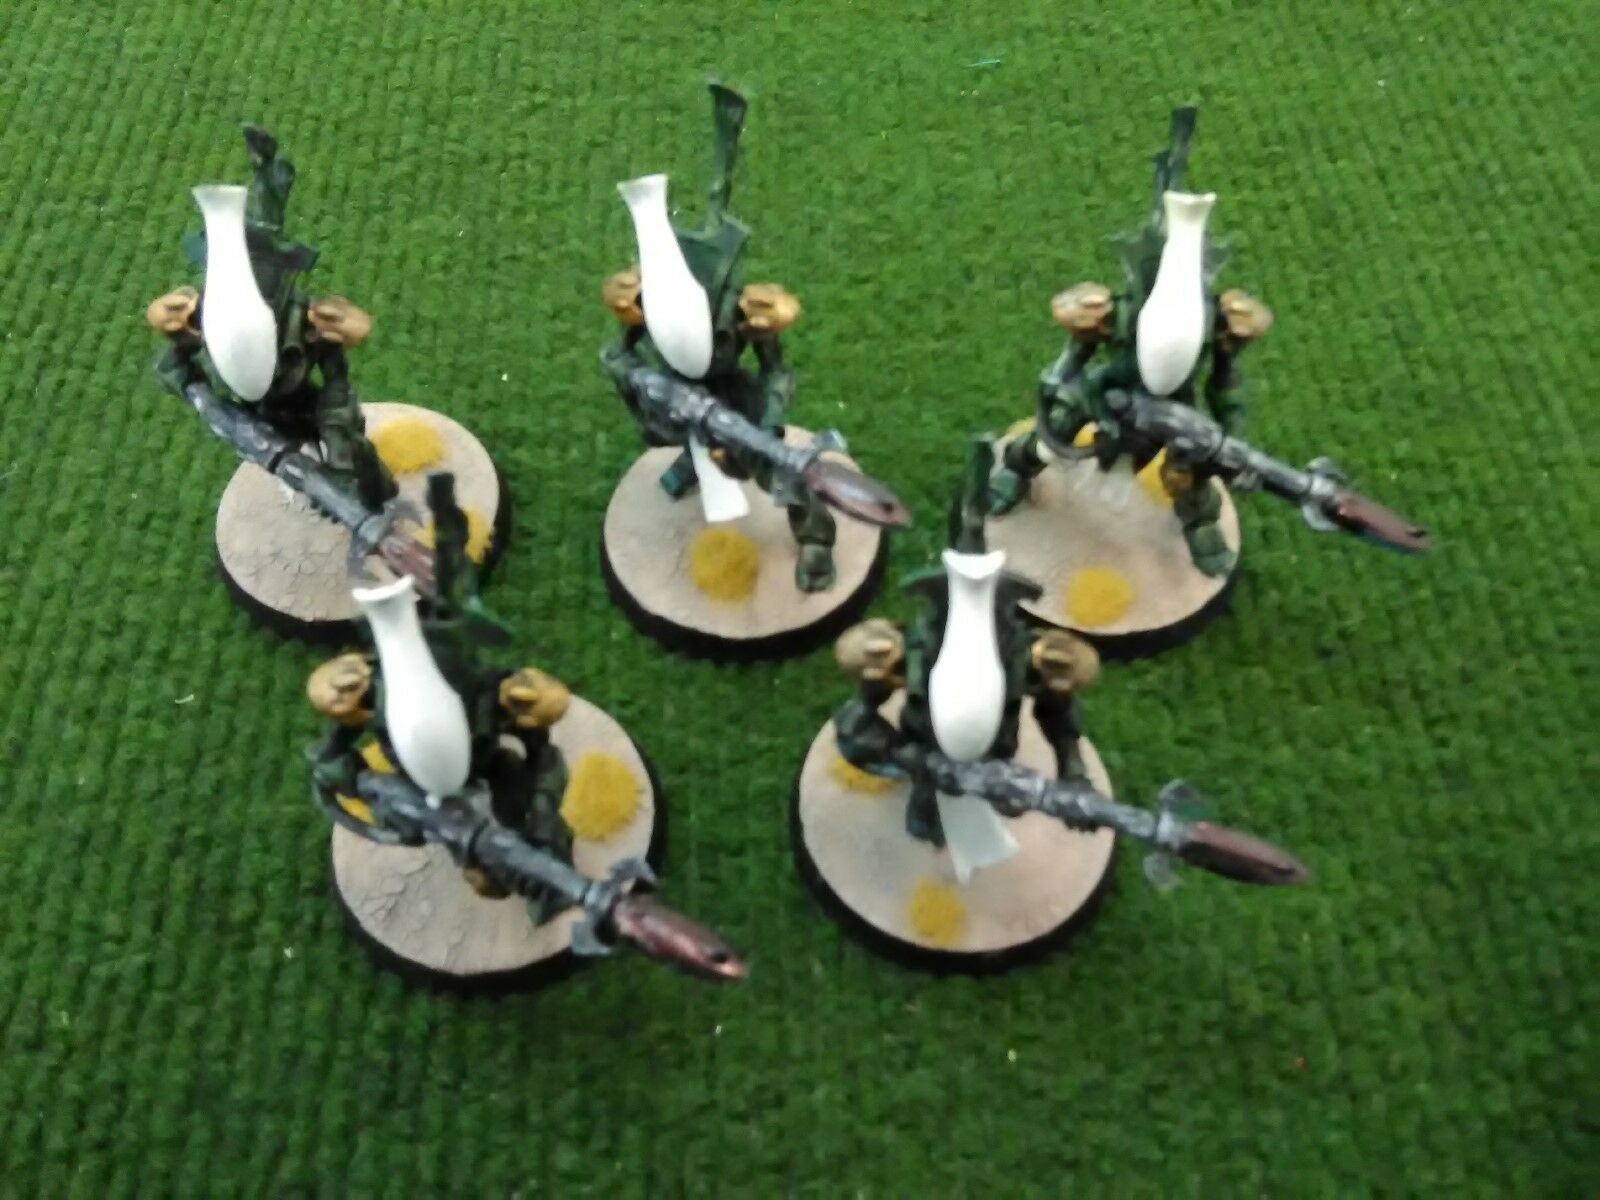 Warhammer 40k Eldar Wraithguard Painted (5 Models)